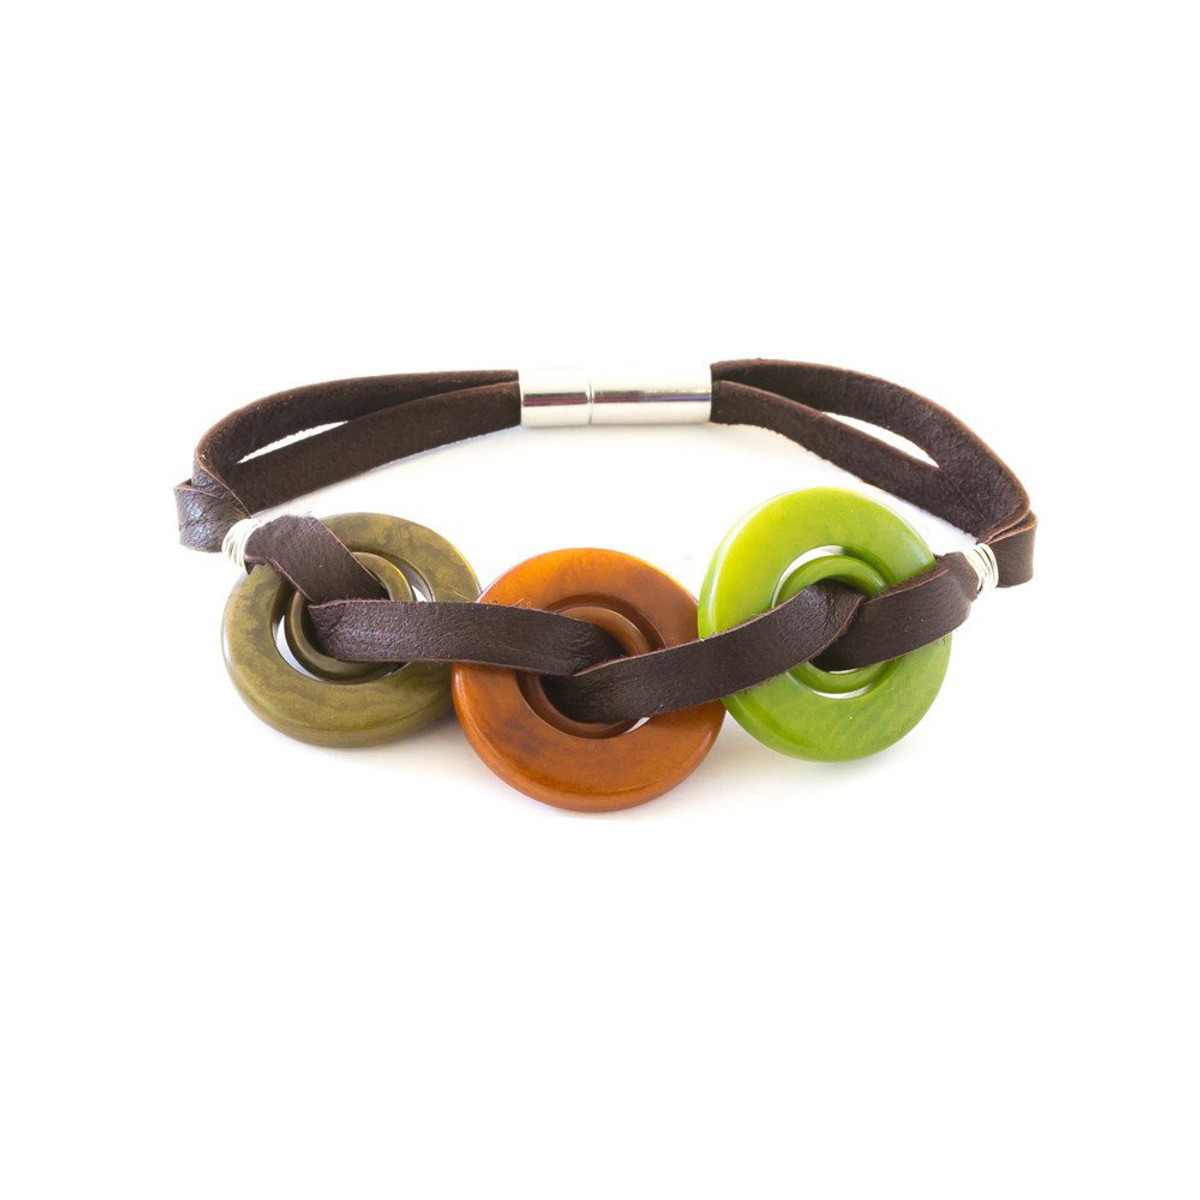 Encanto Ekho Style Bracelet - Multi Color